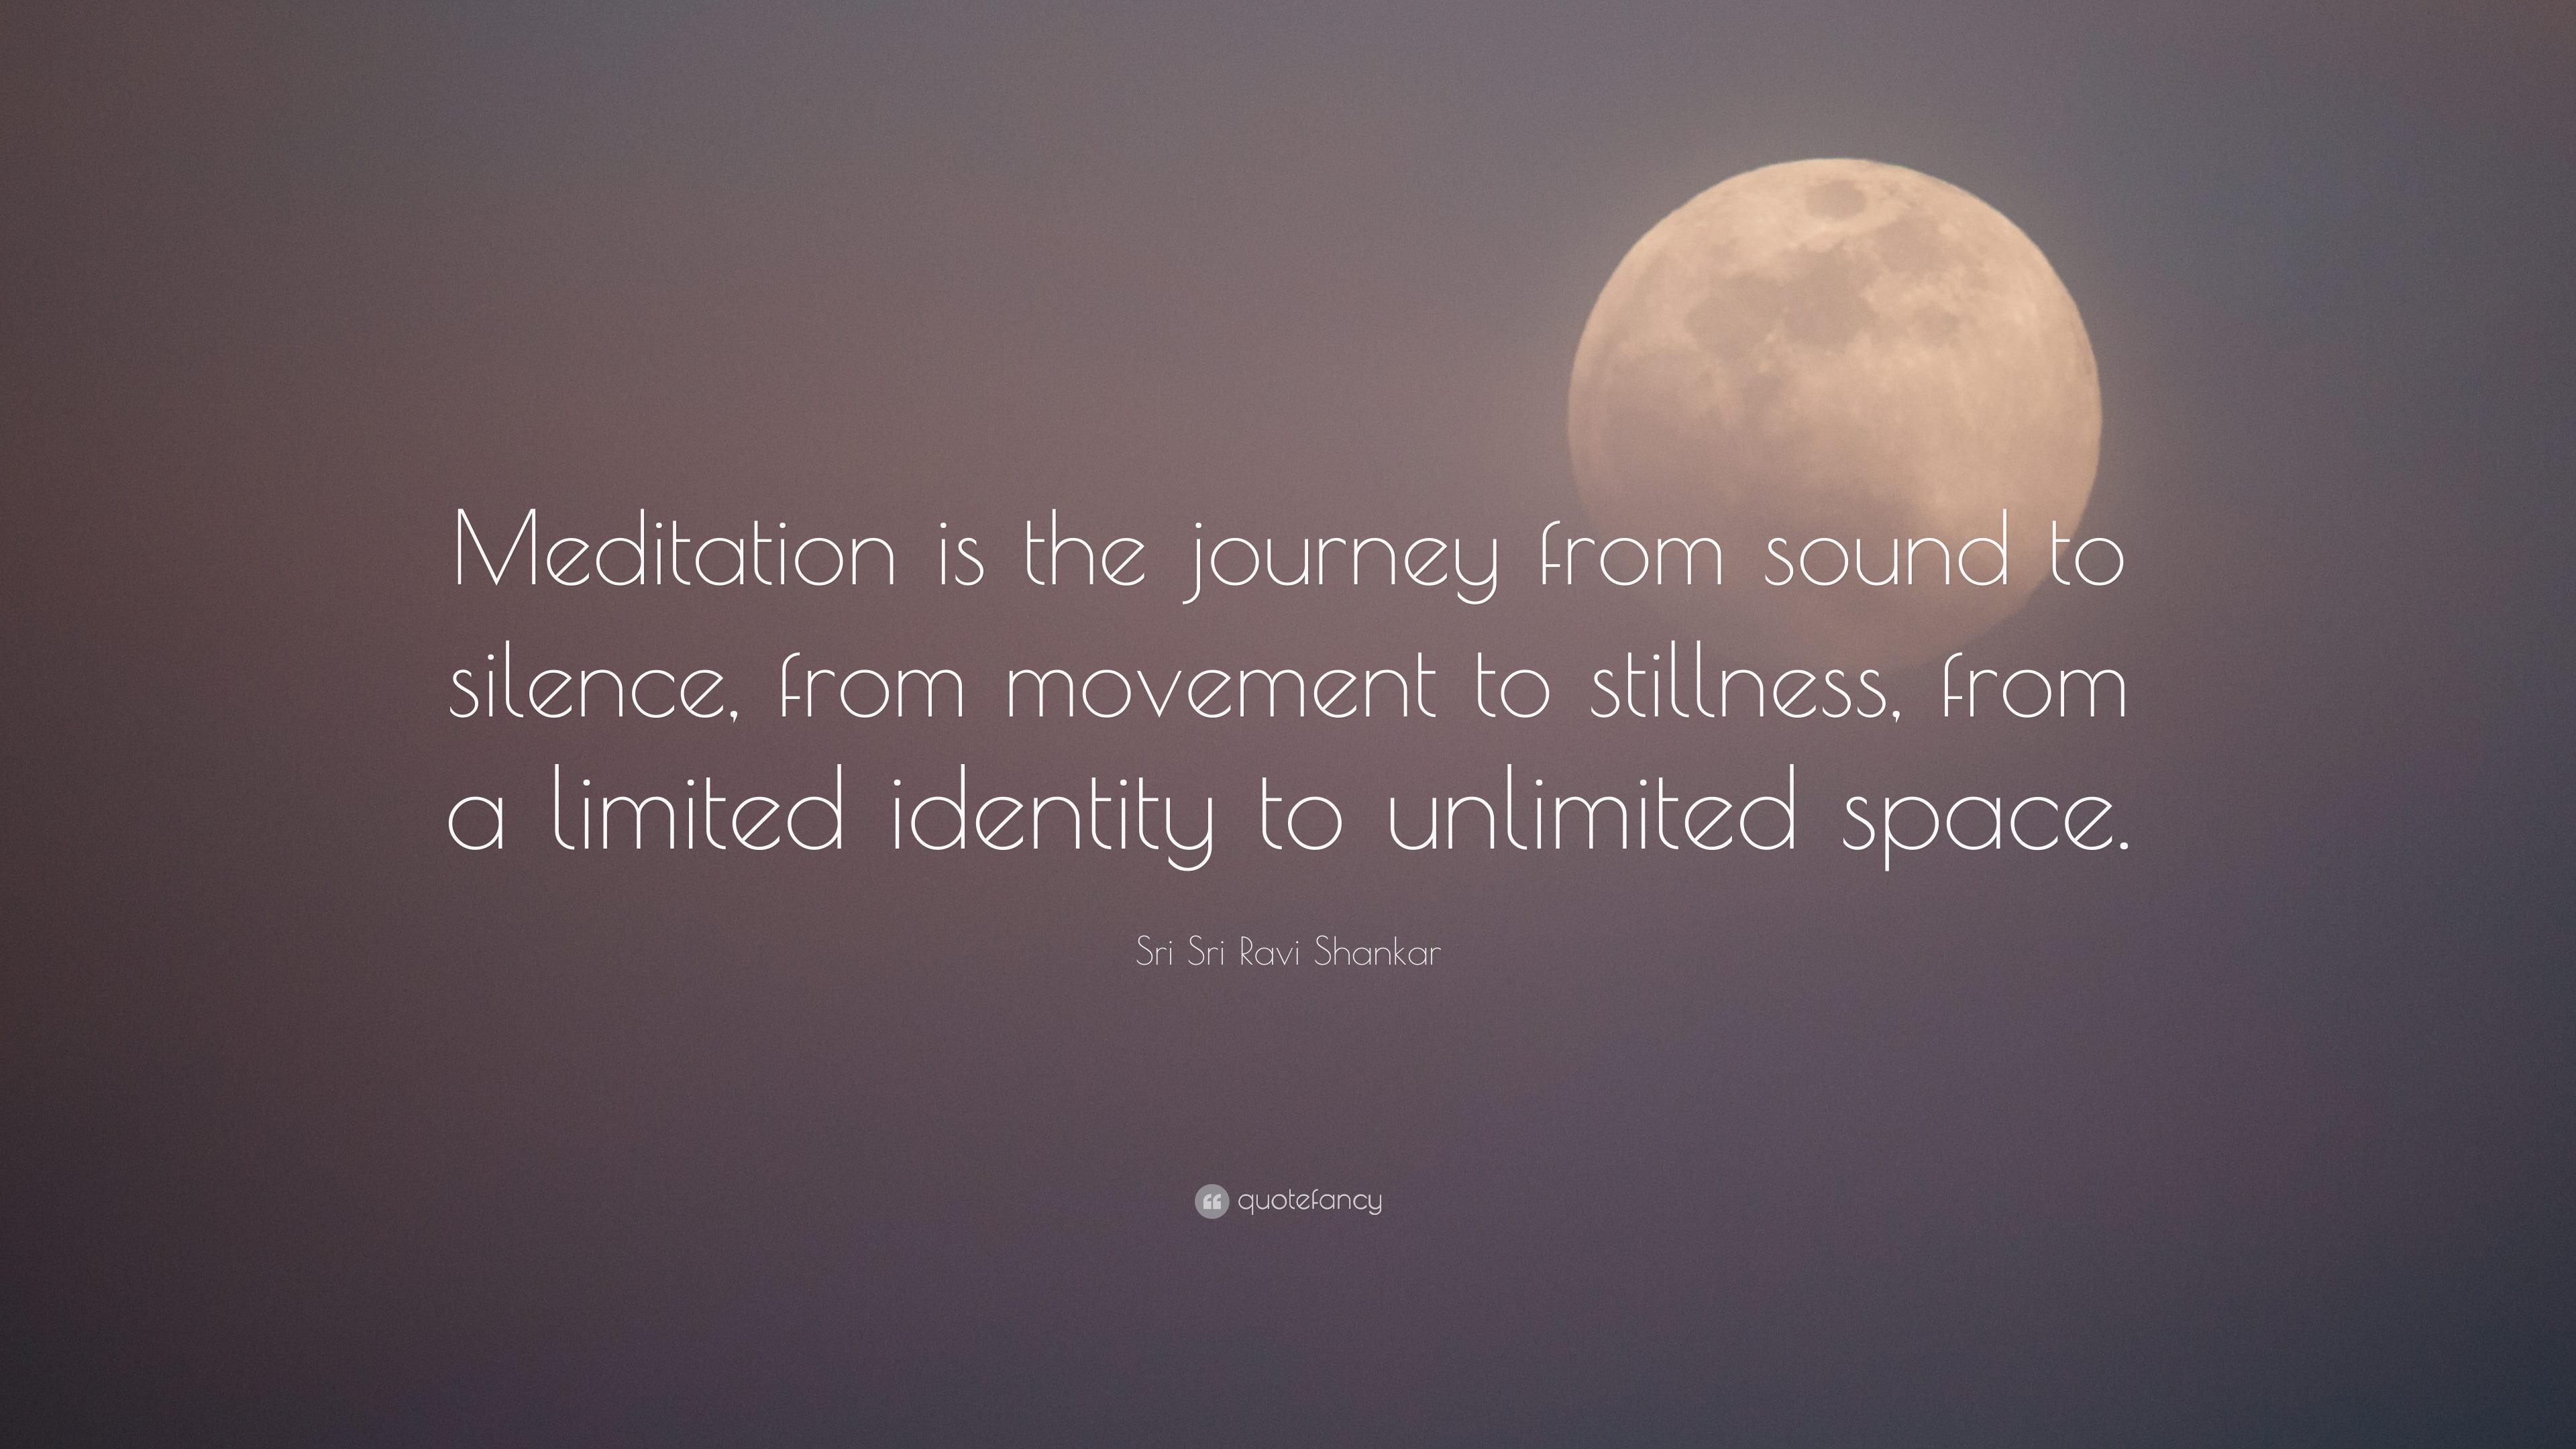 Sri Sri Ravi Shankar Quote Meditation Is The Journey From Sound To